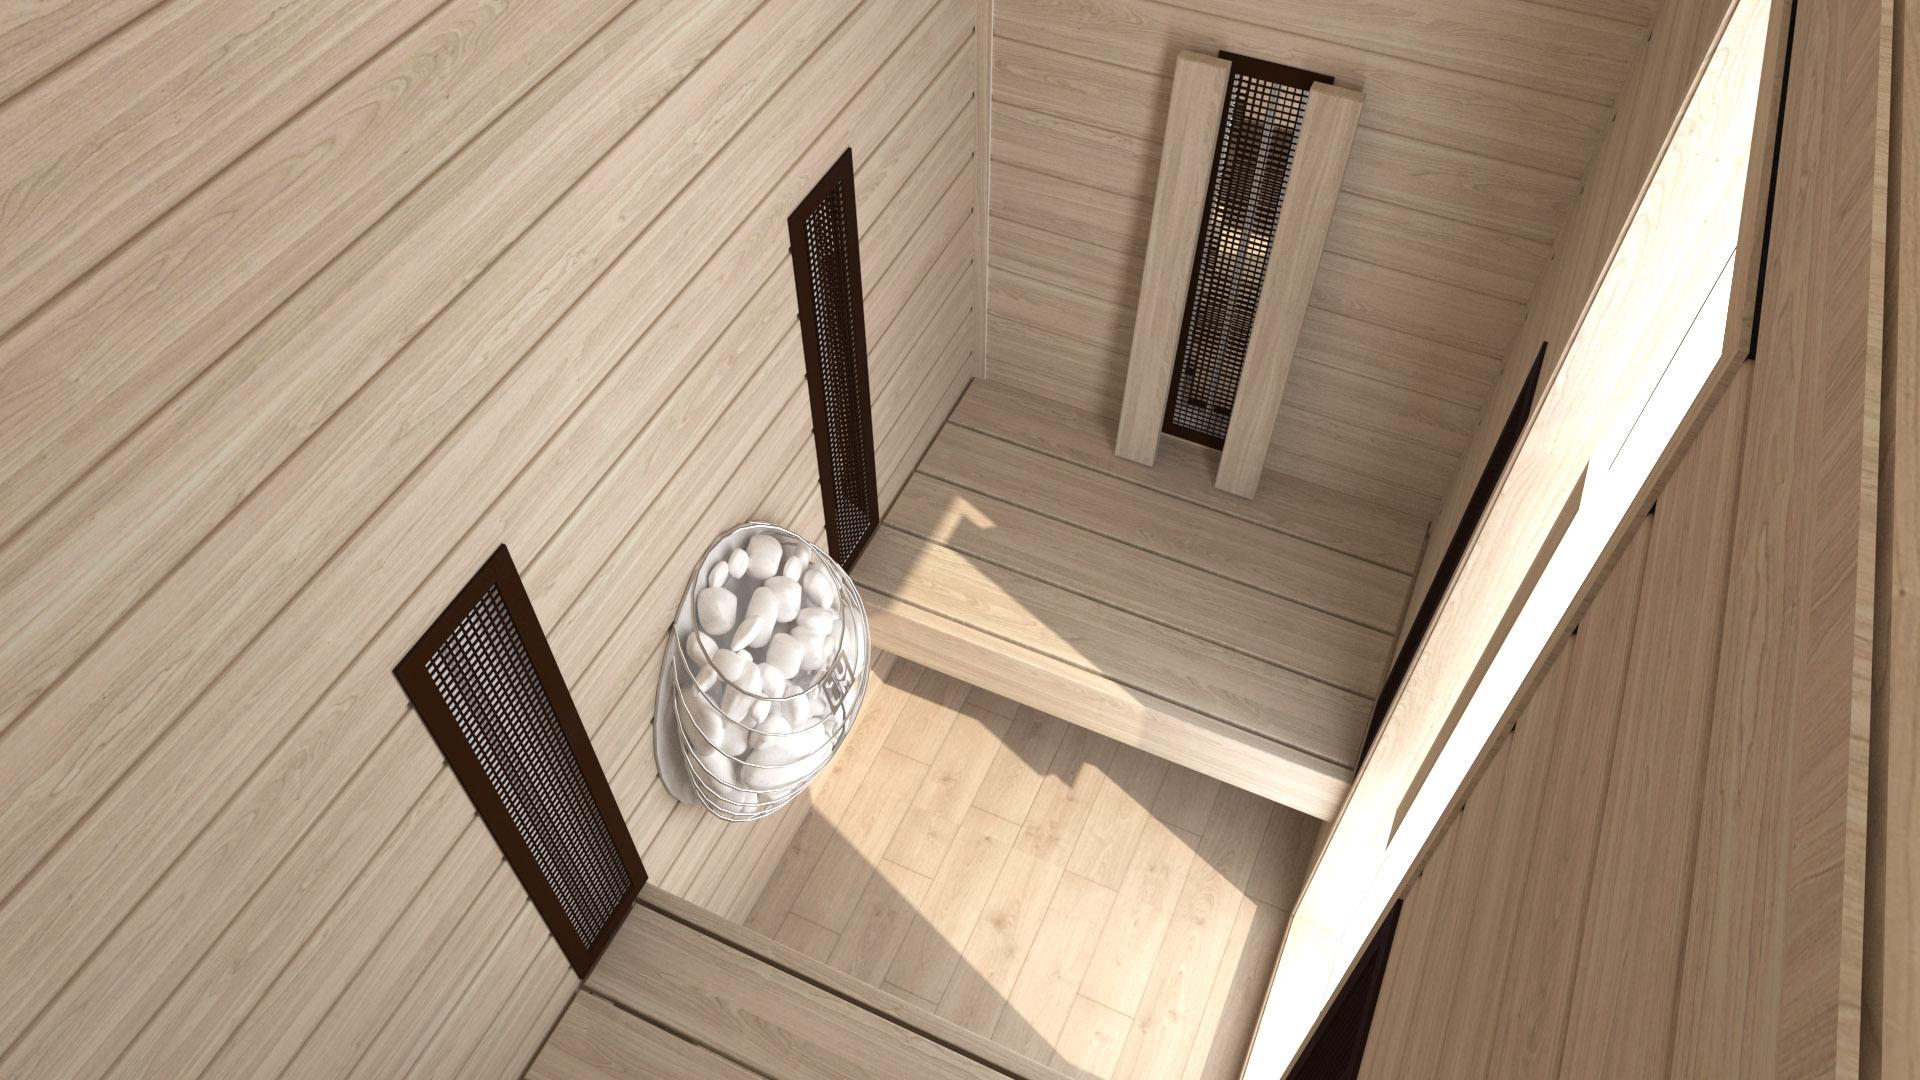 INUA Heimdall udendoers kombi sauna_infraroed sauna4